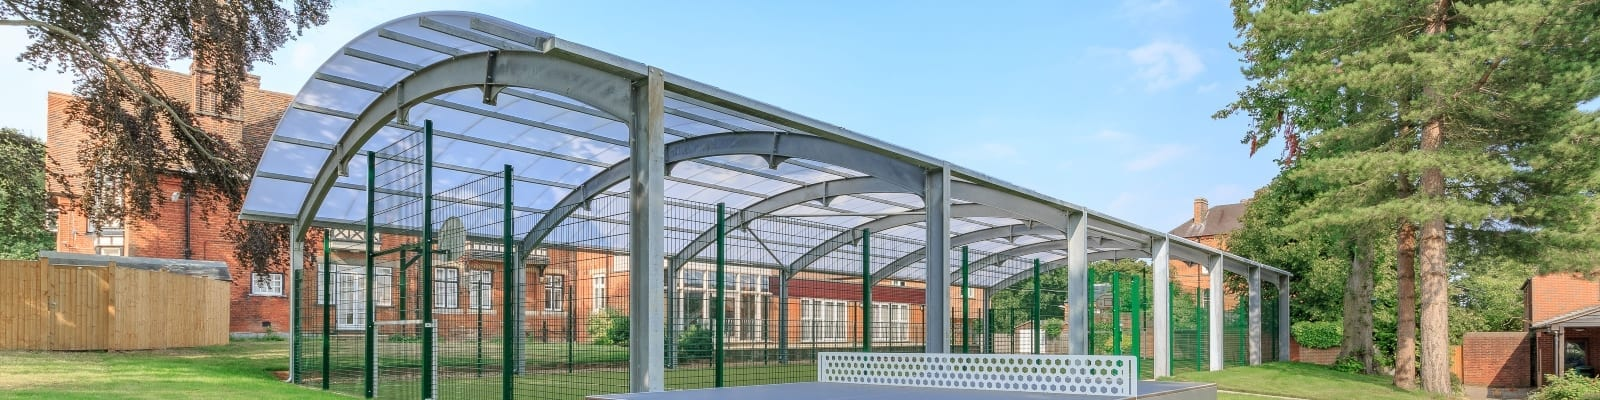 Haileybury College Covered MUGA